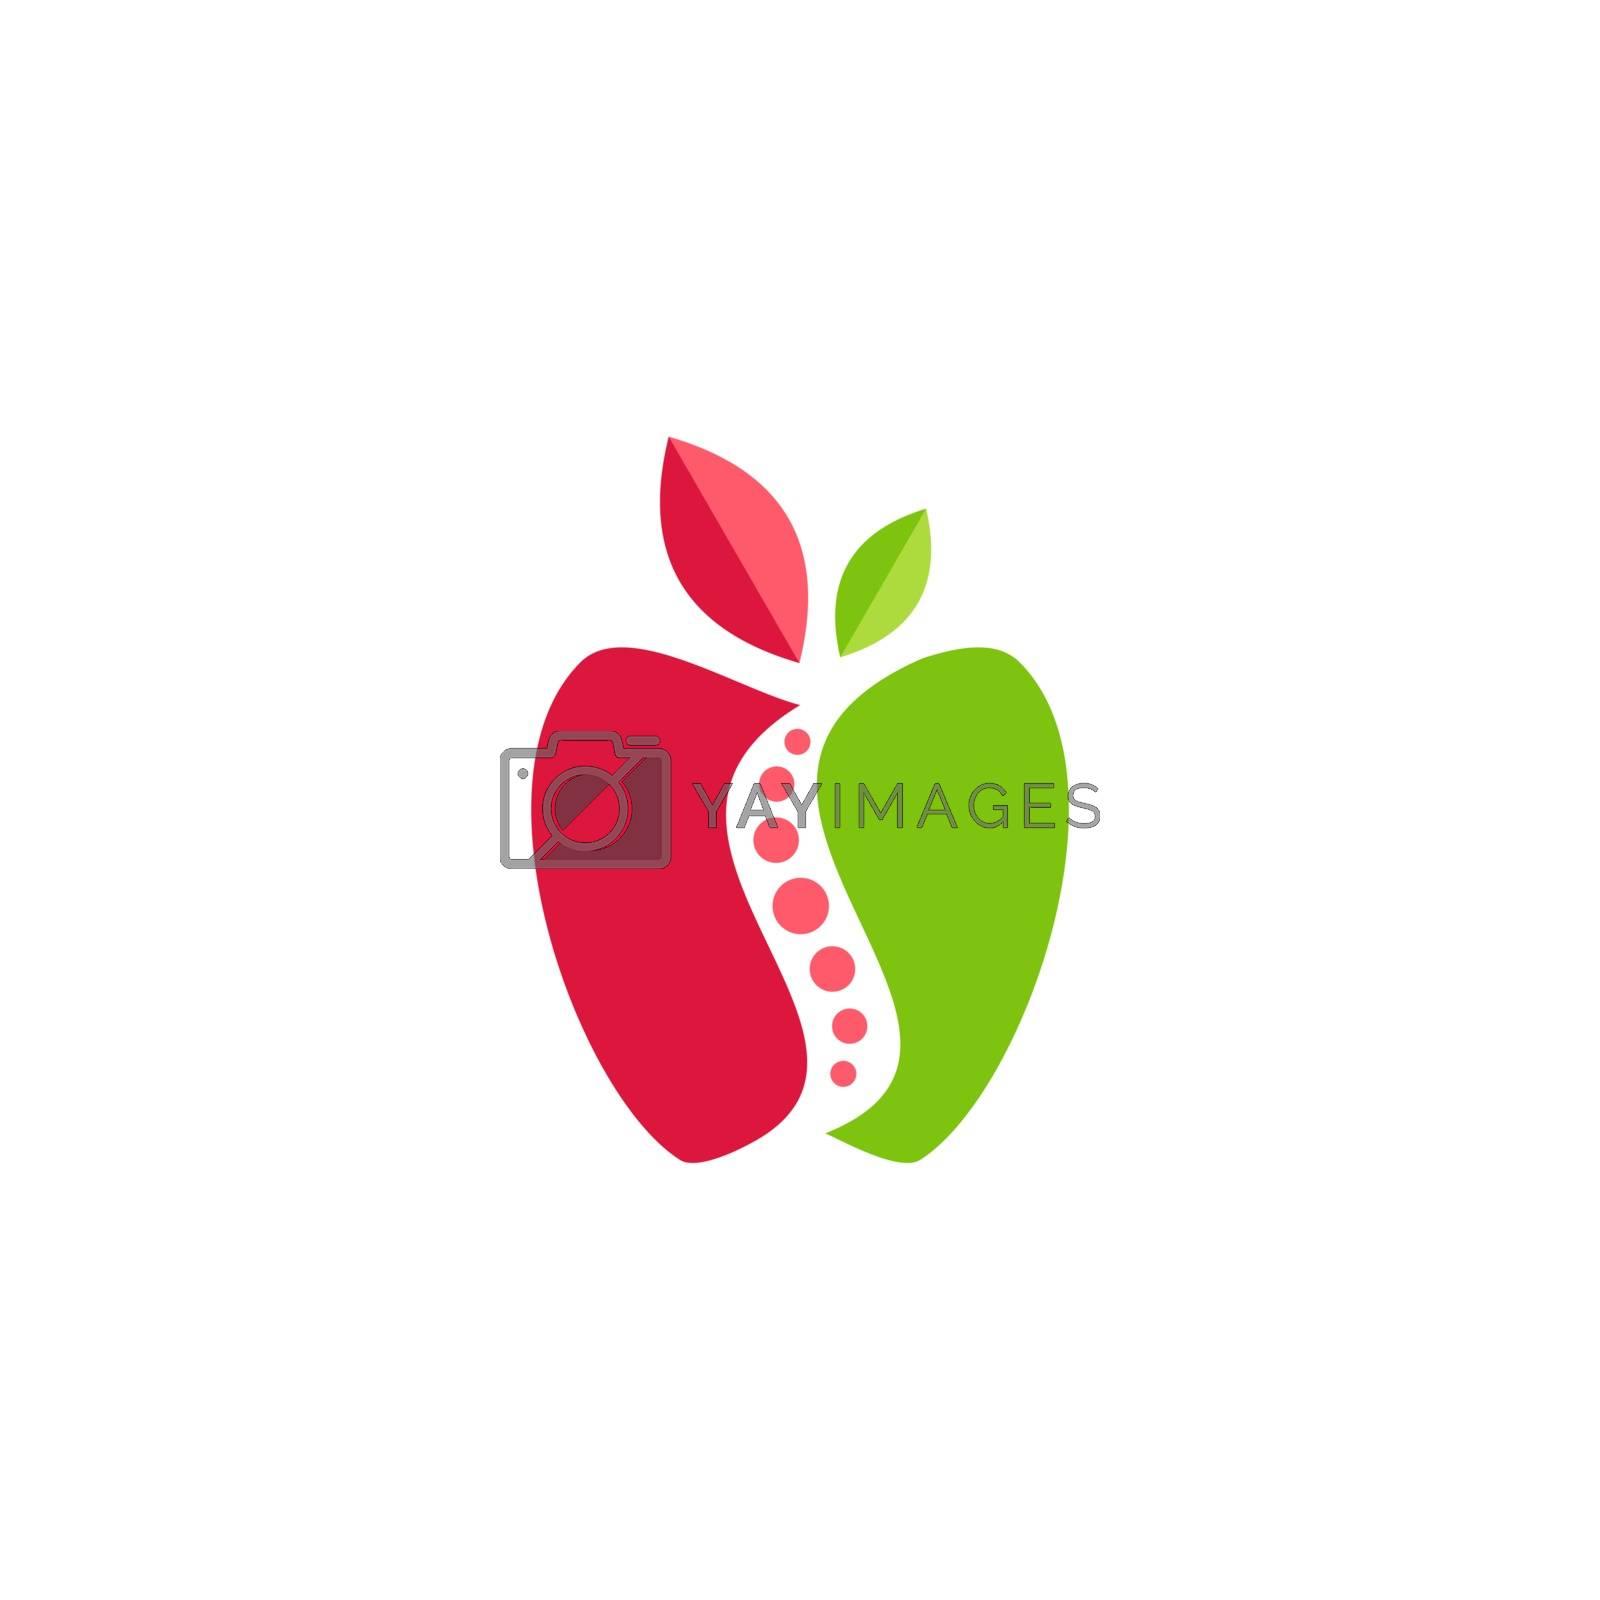 apple fruit nutrition logo symbol icon vector design, red green apple conceptual spine health care illustration logotype